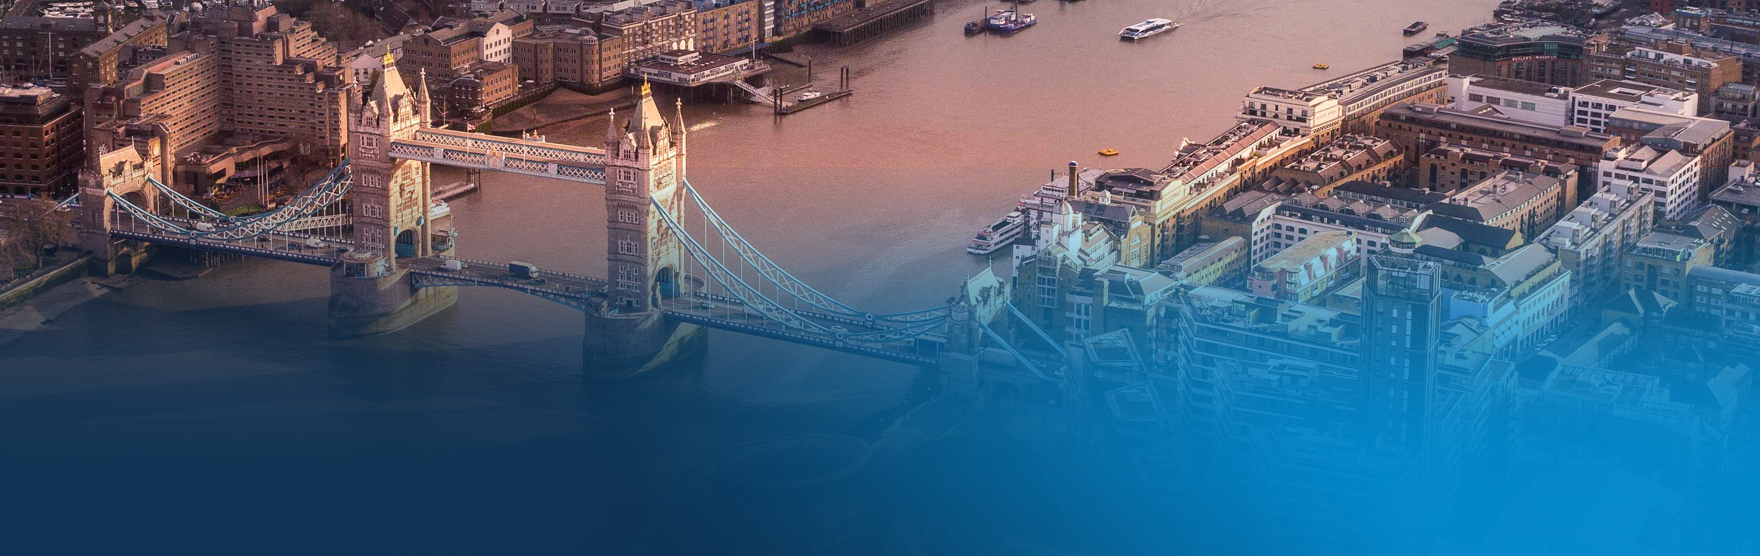 London, UK - 12-13 October, 2019